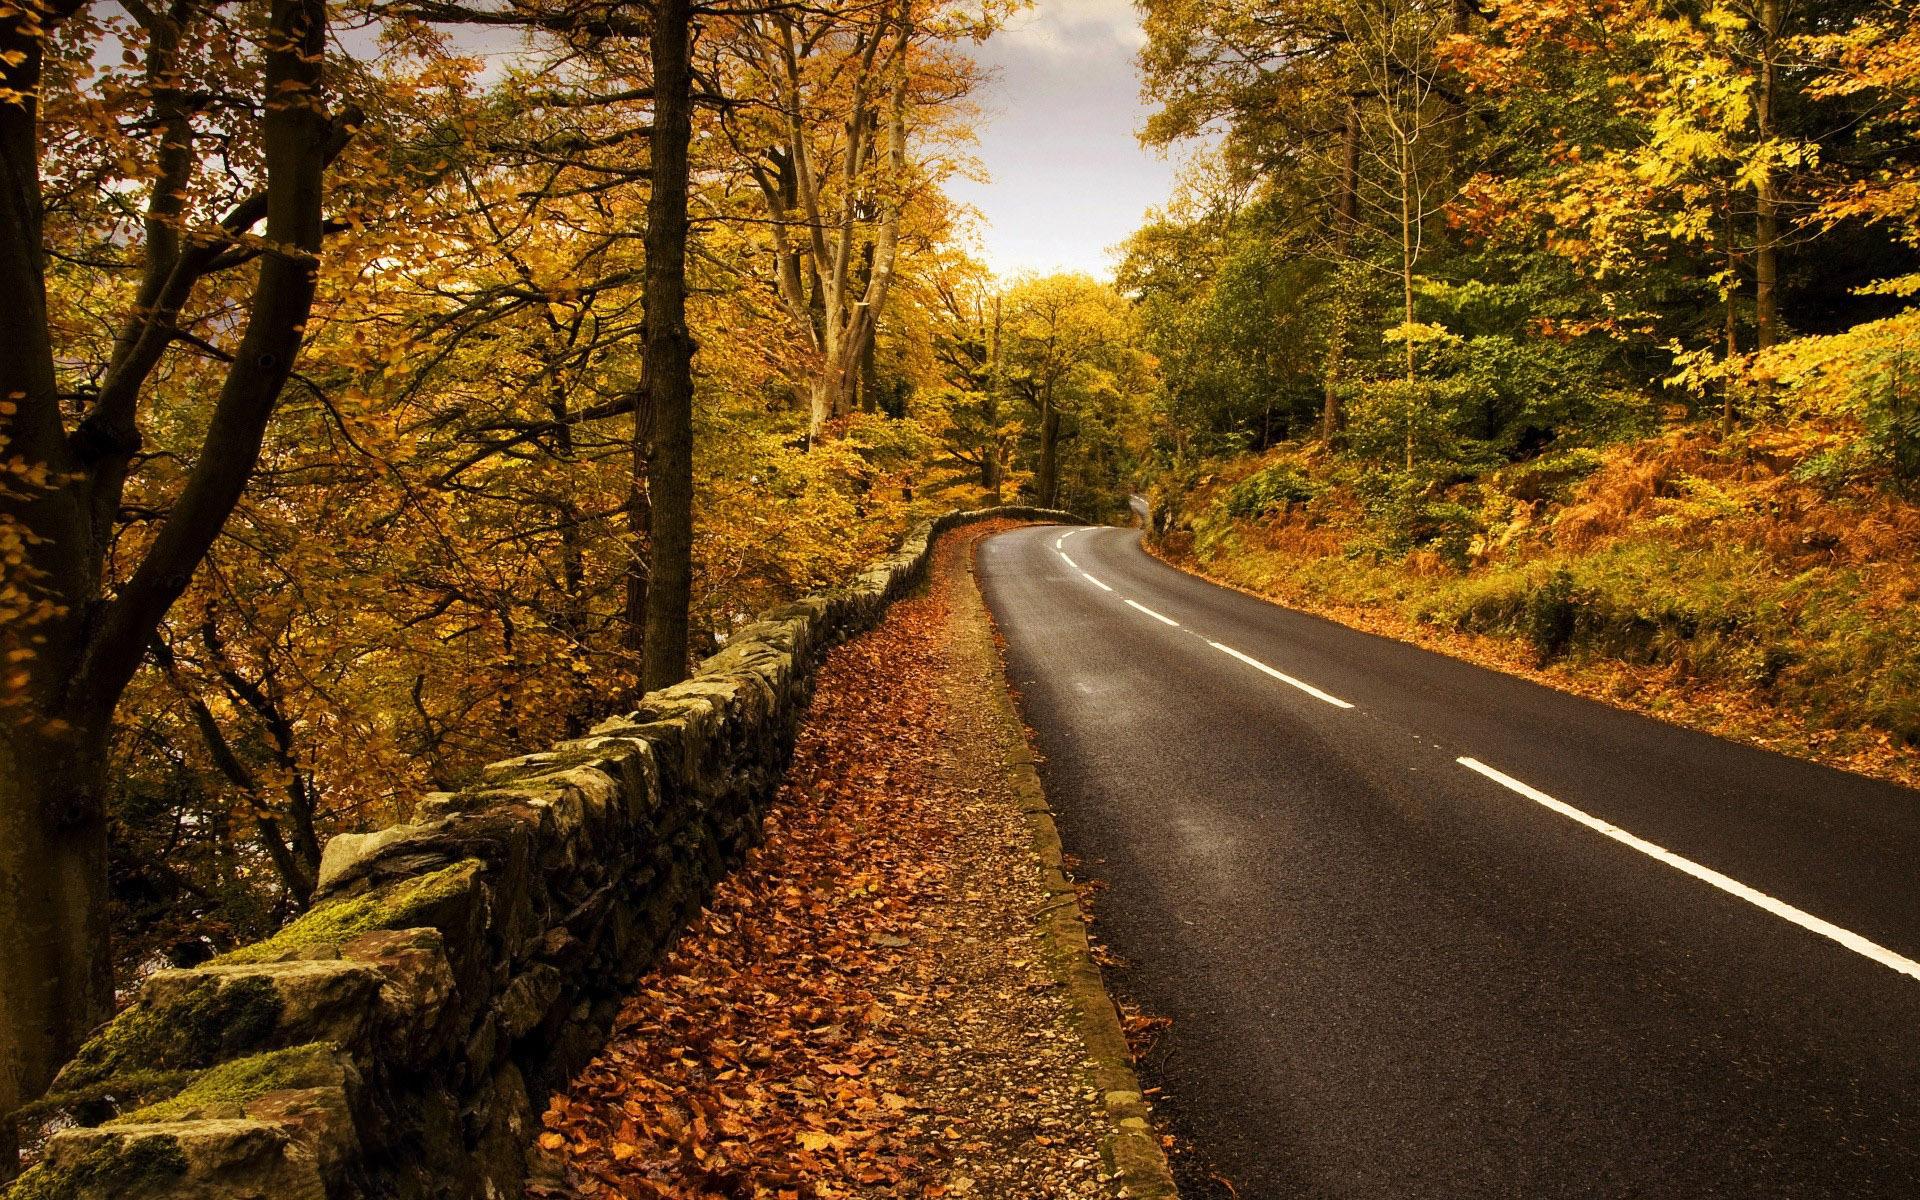 Smoky Mountains Fall Wallpaper Gorgeous Mountain Road Wallpaper 37802 1920x1200 Px